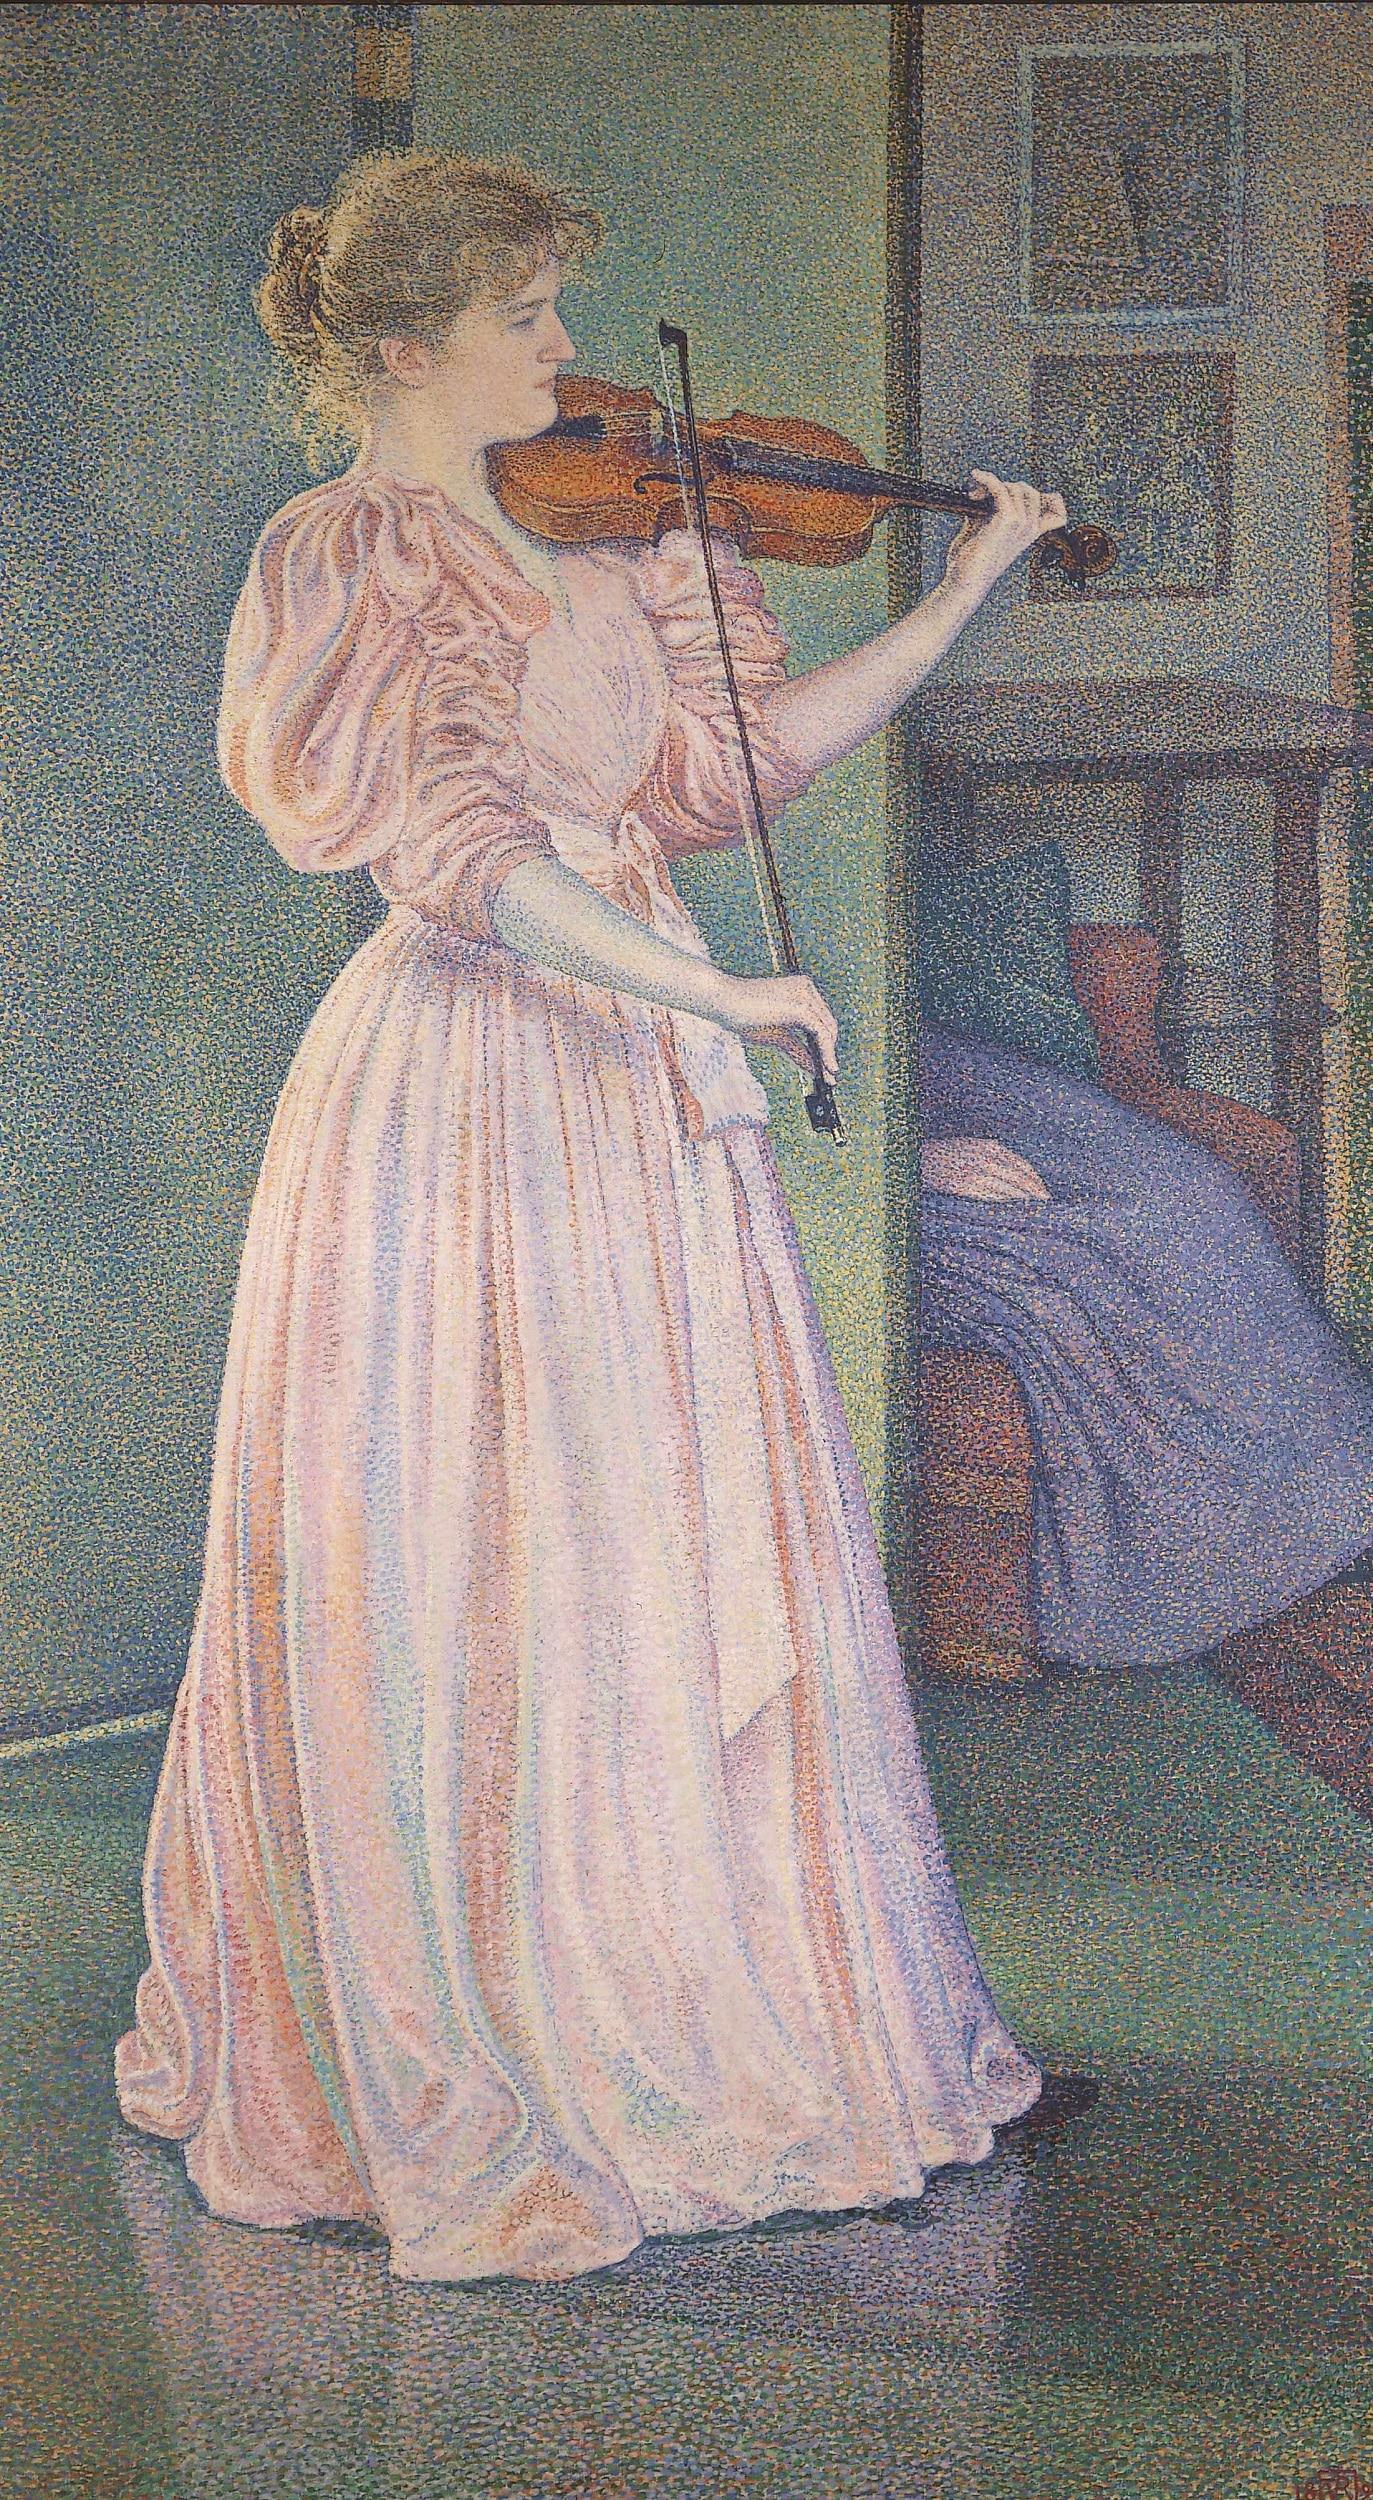 Théo van Rysselberghe, Portrait de la violoniste Irma Sèthe